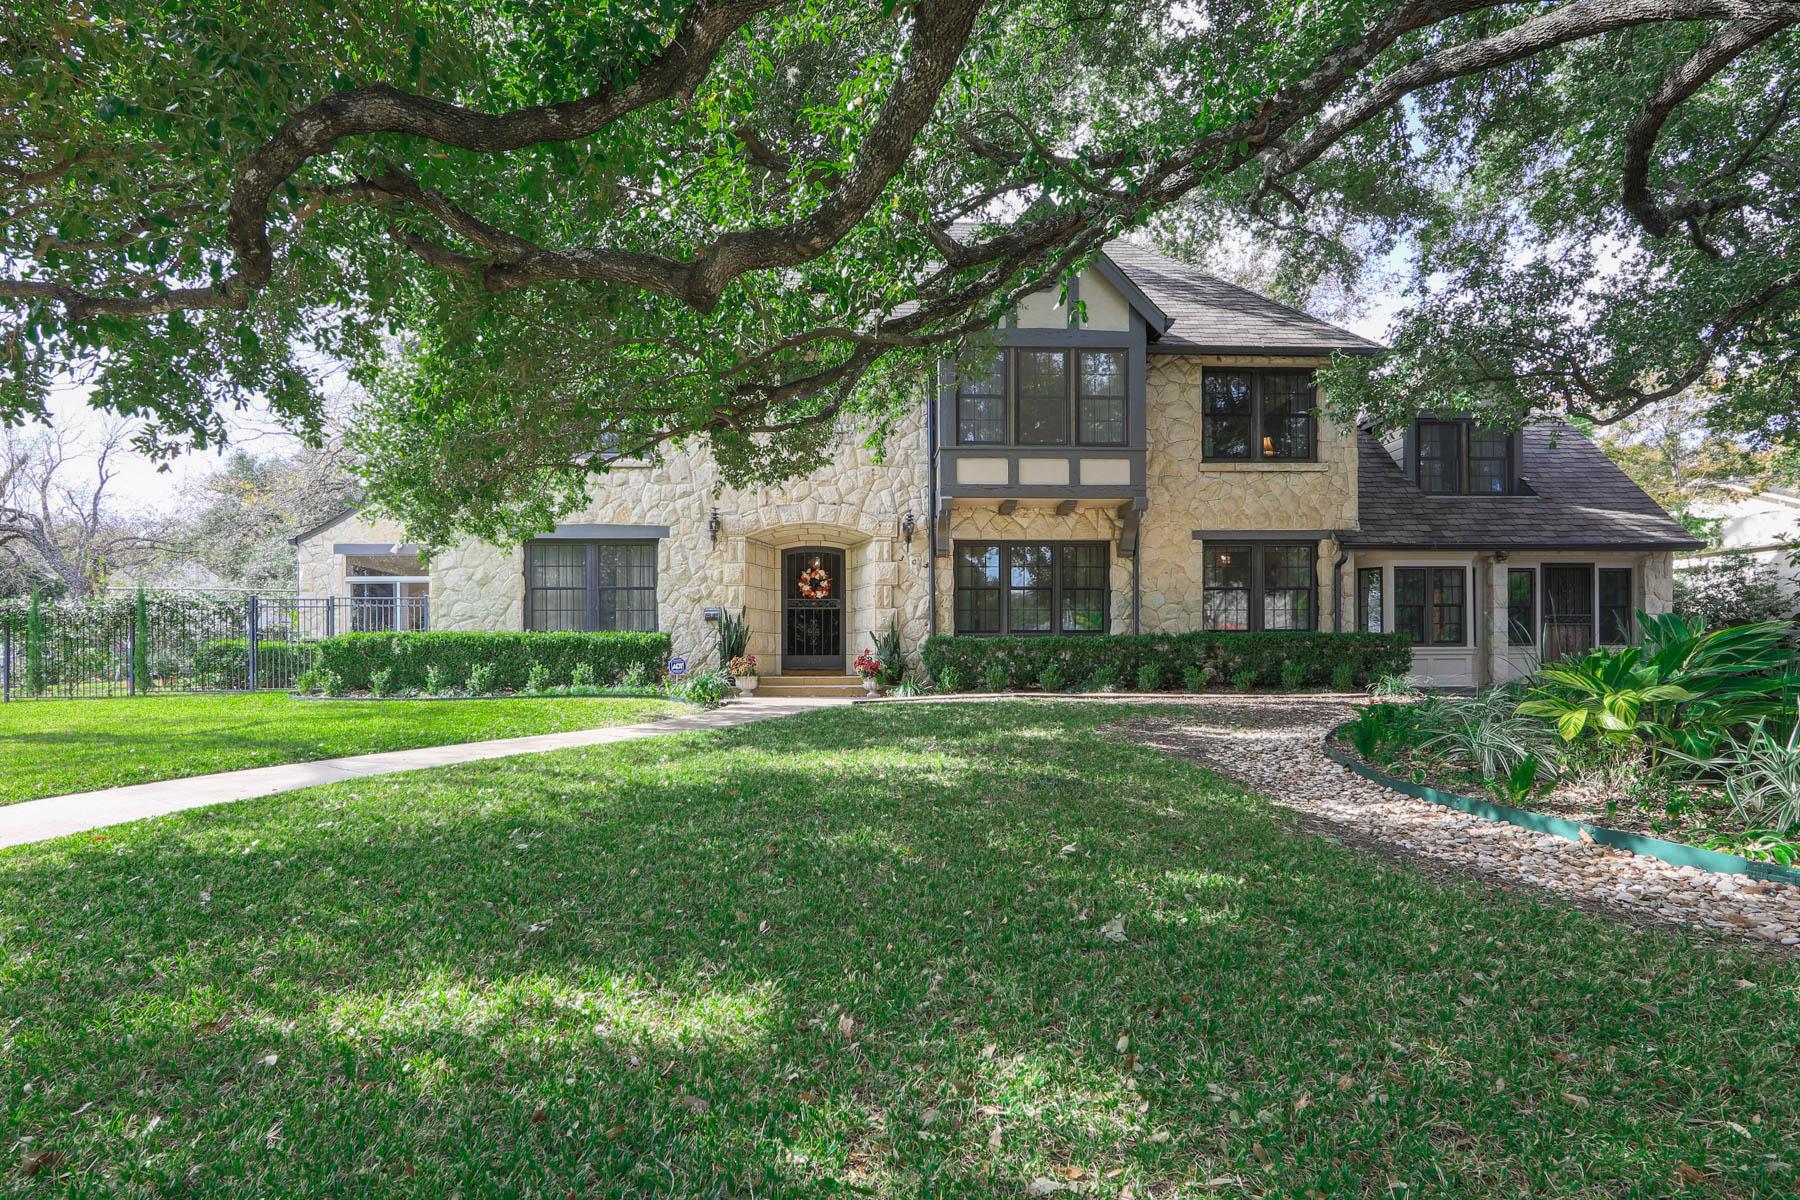 Single Family Home for Sale at Stunning Olmos Park Tudor 303 W El Prado Dr San Antonio, Texas 78212 United States